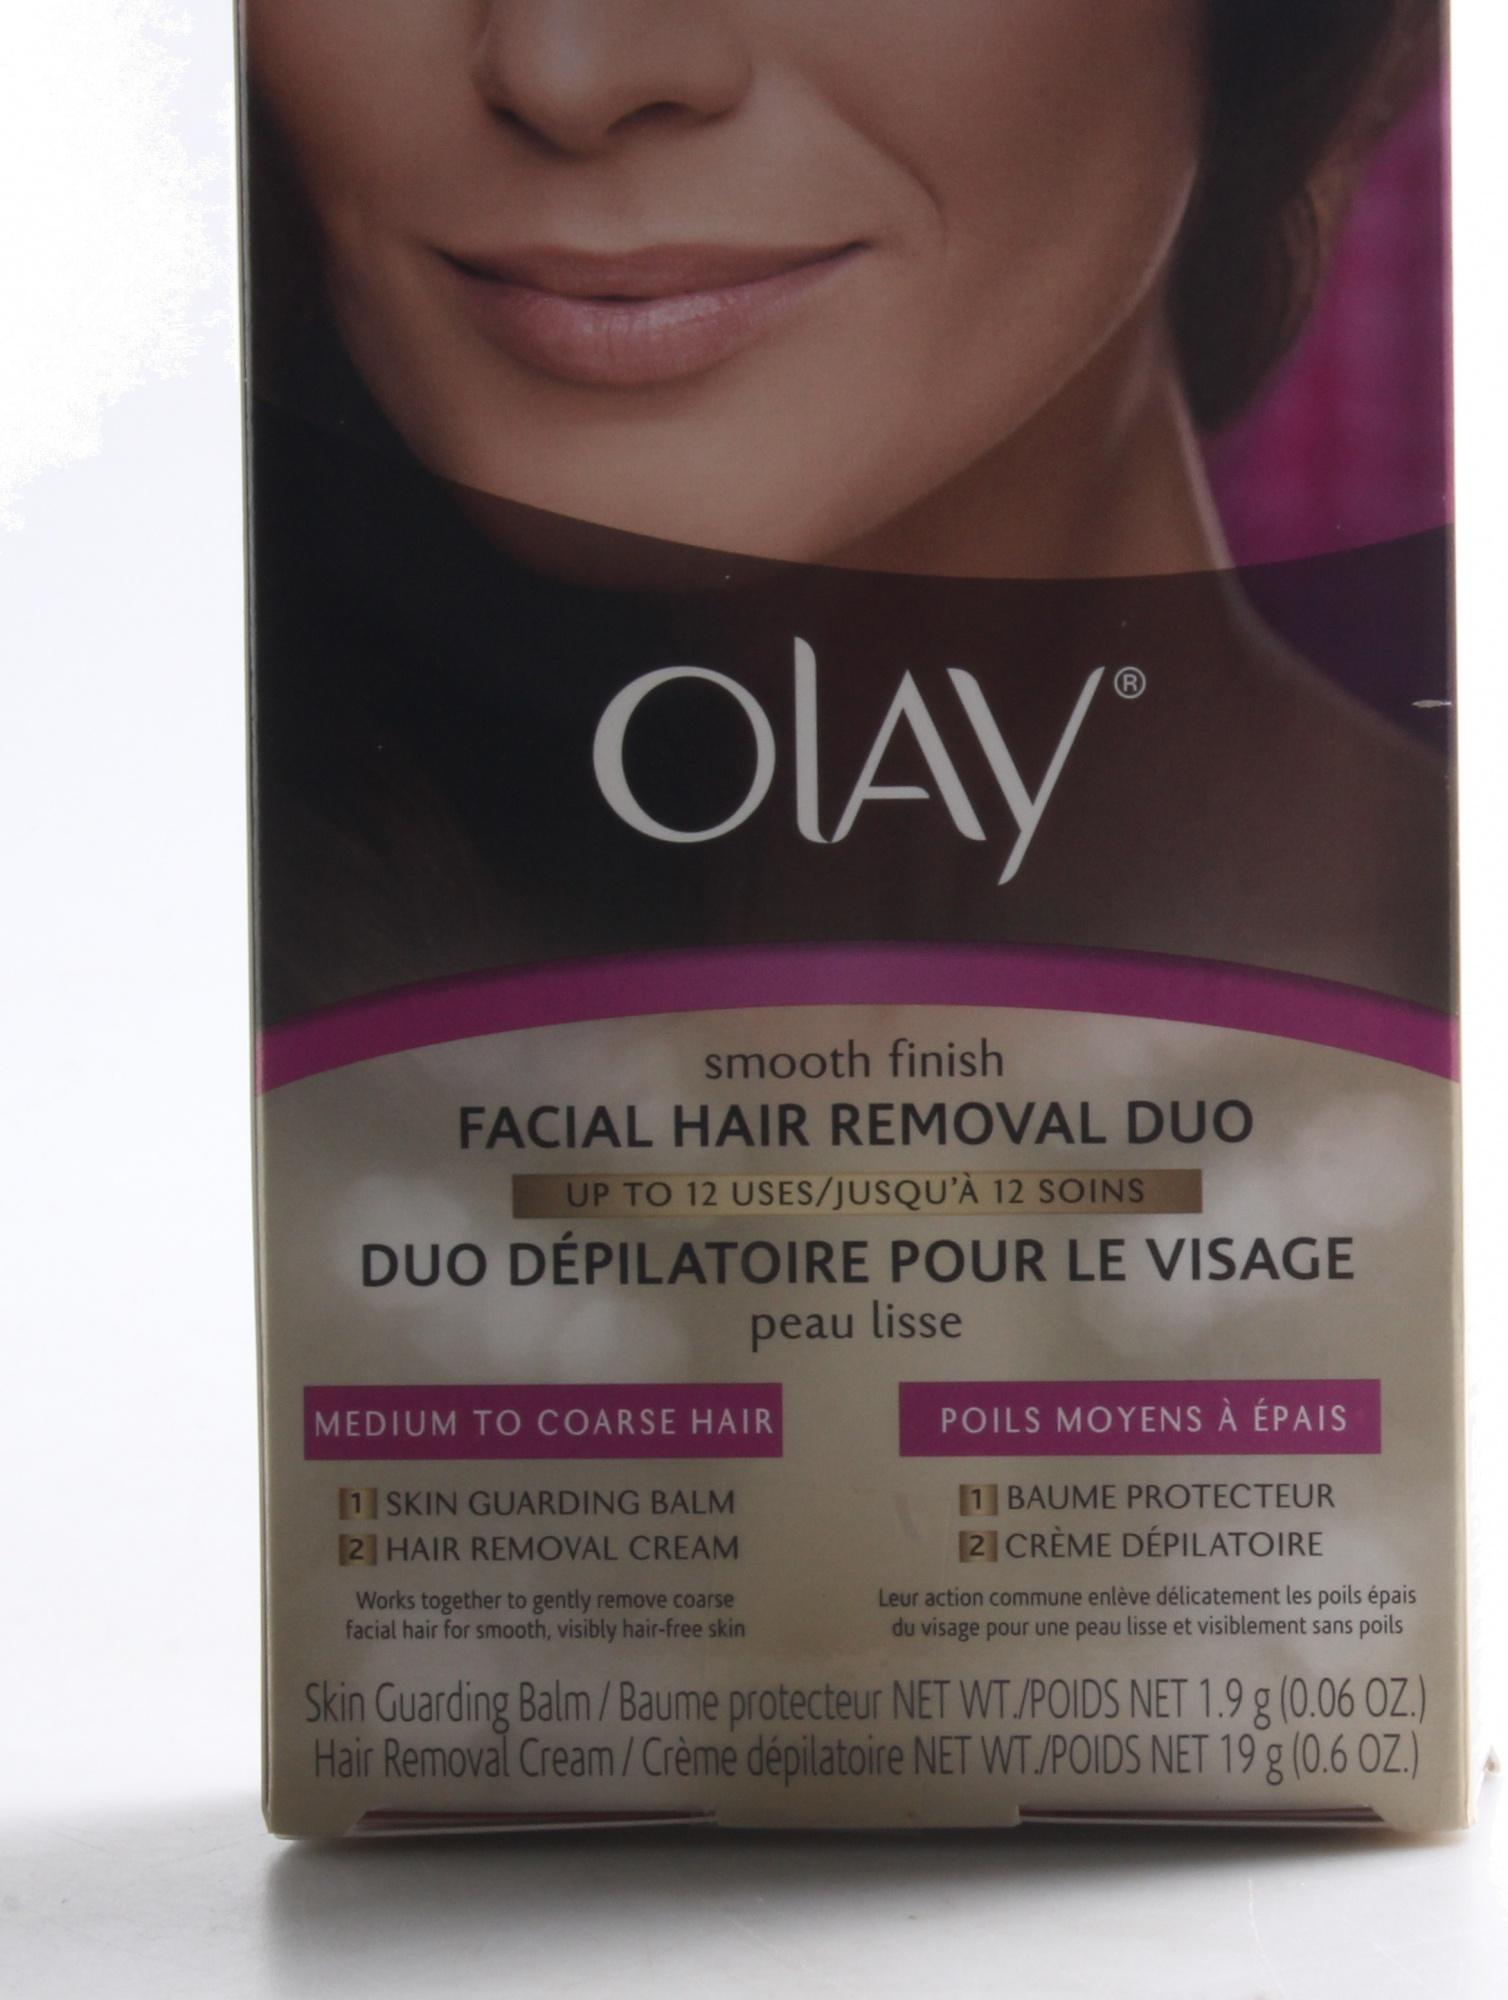 Olay Smooth Finish Facial Hair Removal Duo Skin Guarding Balm